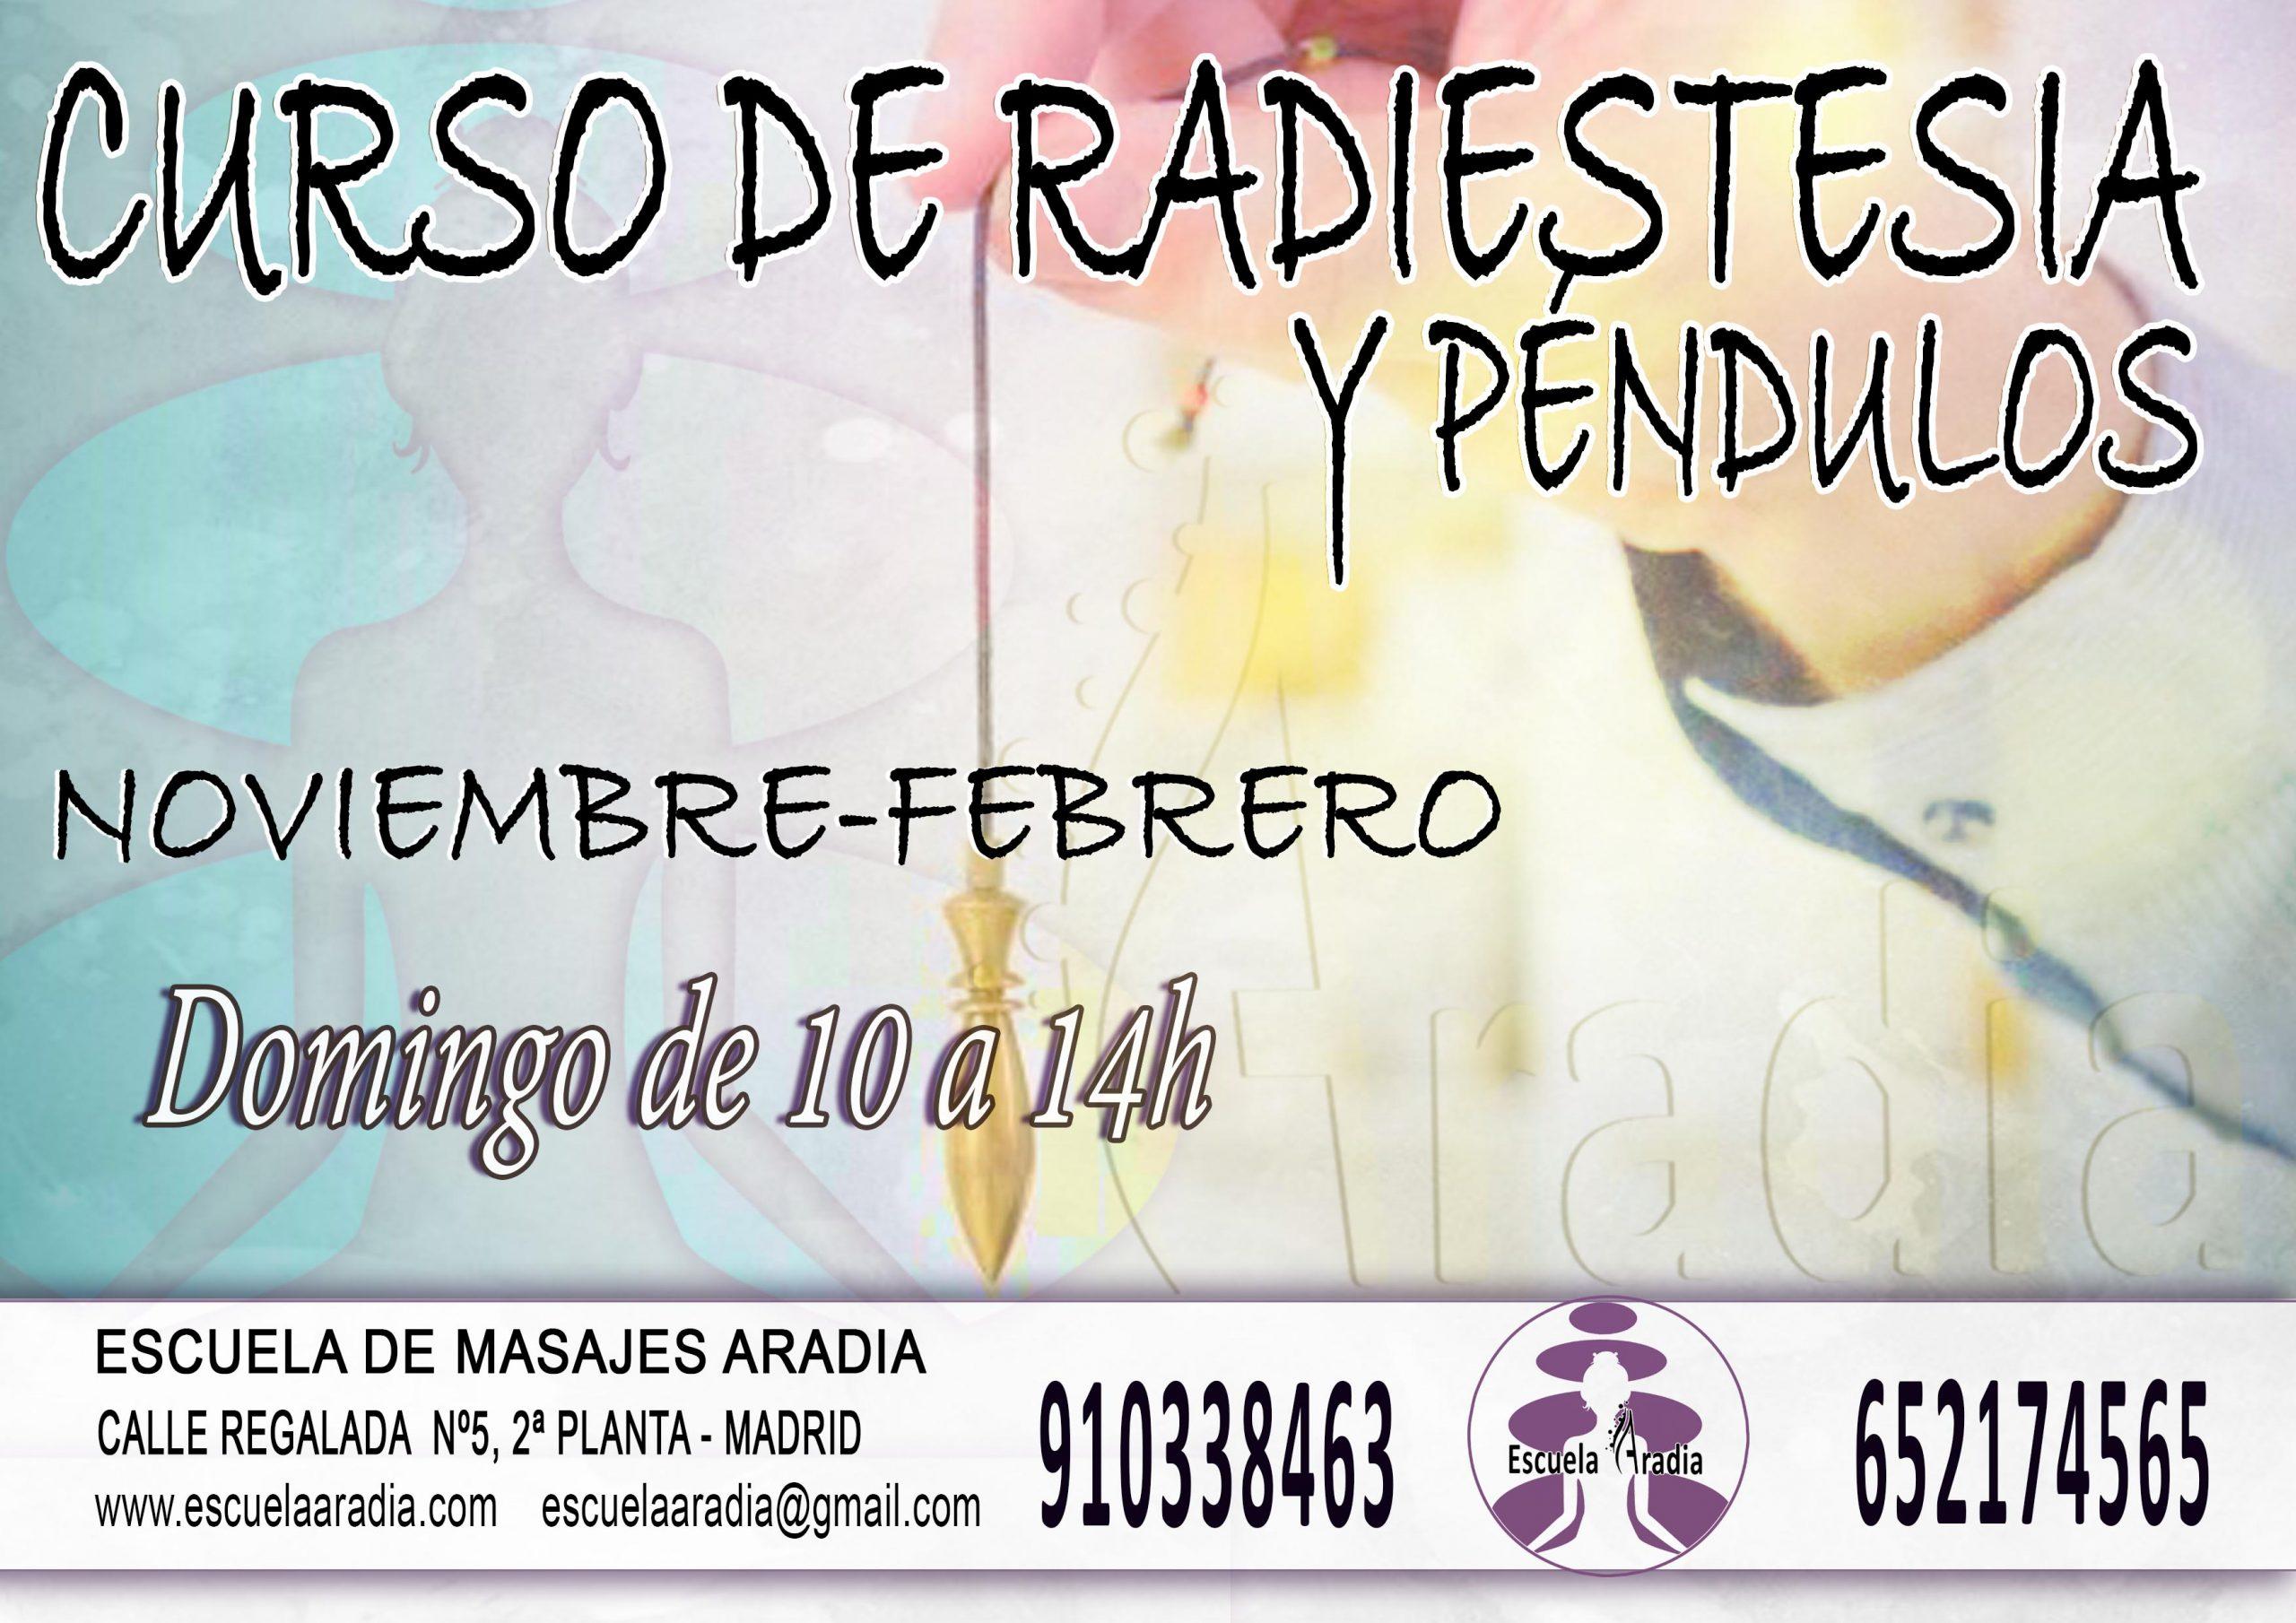 Curso de radiestesia noviembre-febrero